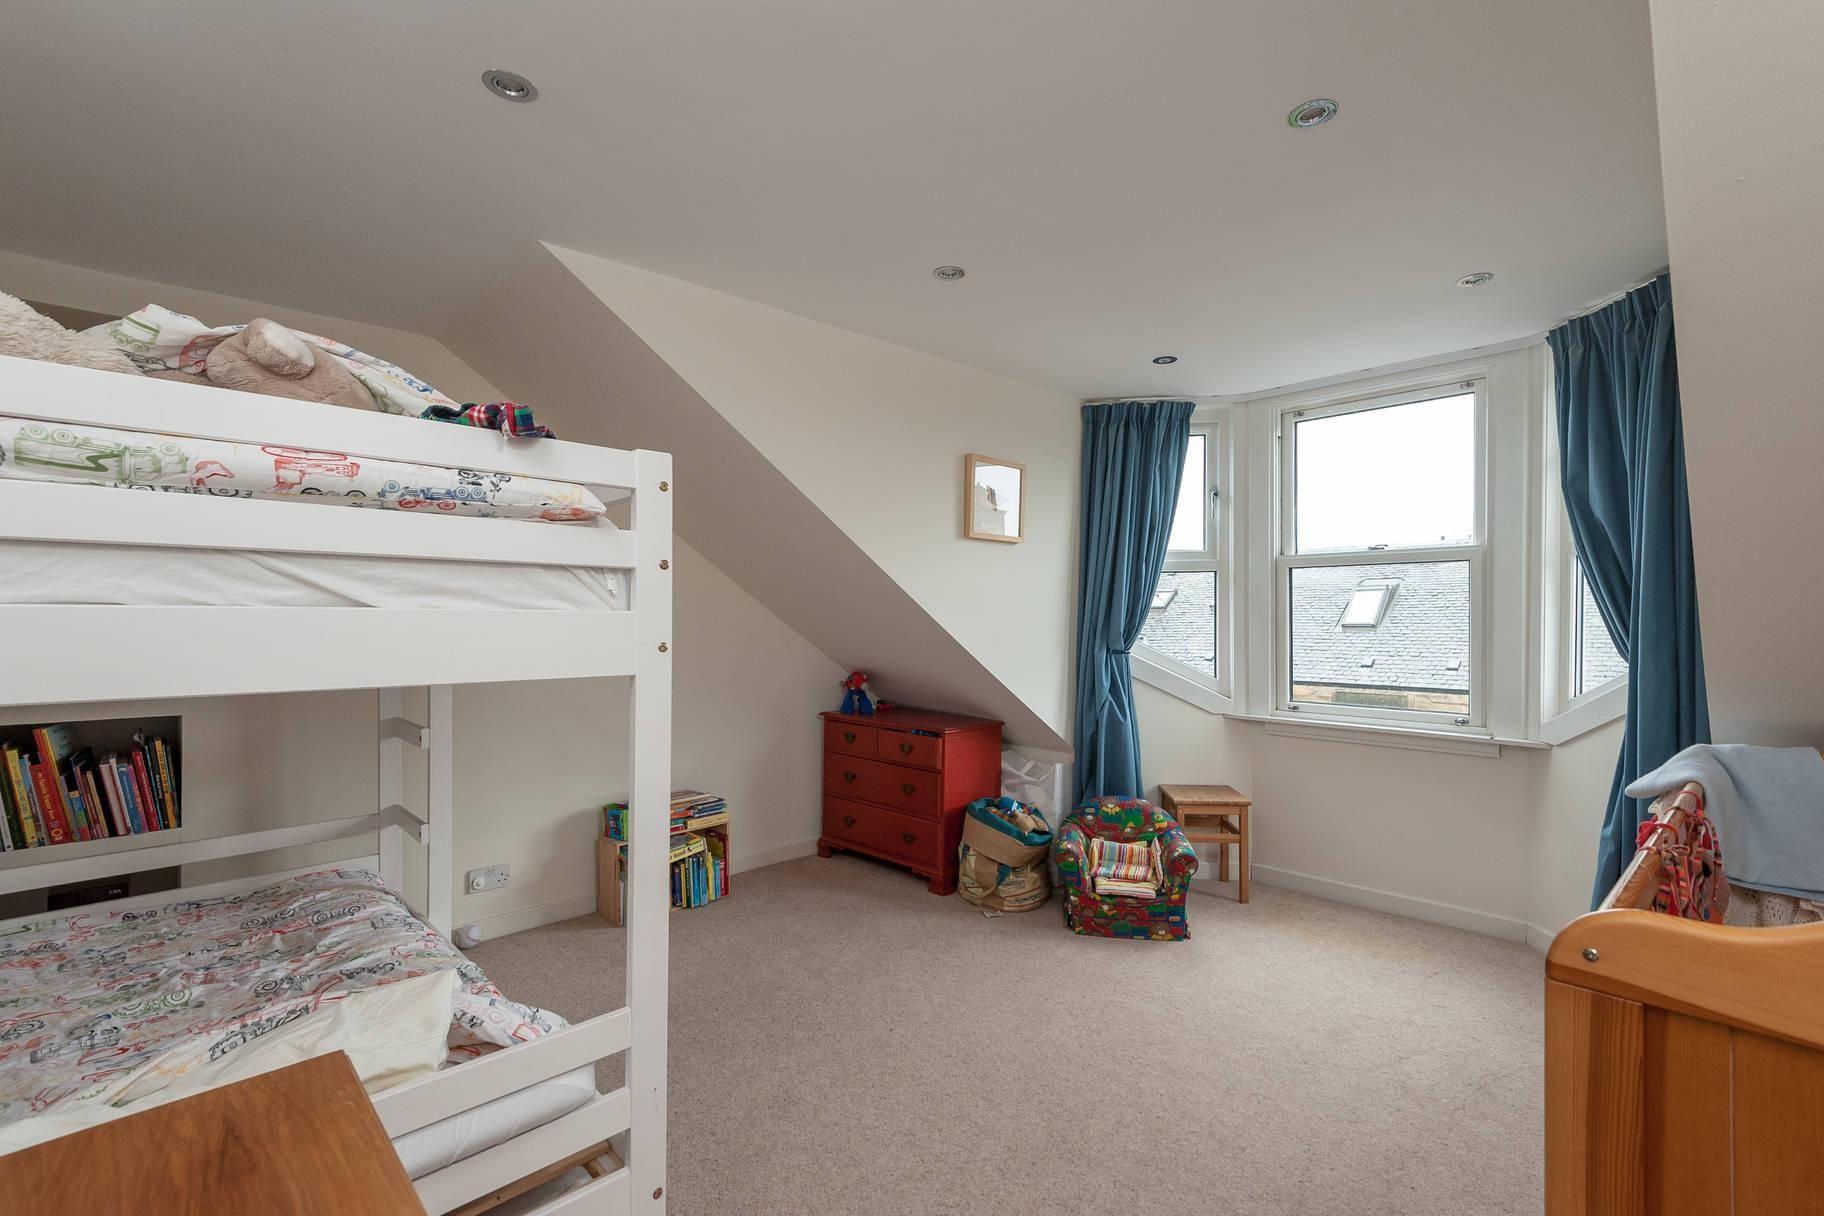 3 Briarbank Terrace, Shandon - Photo 10